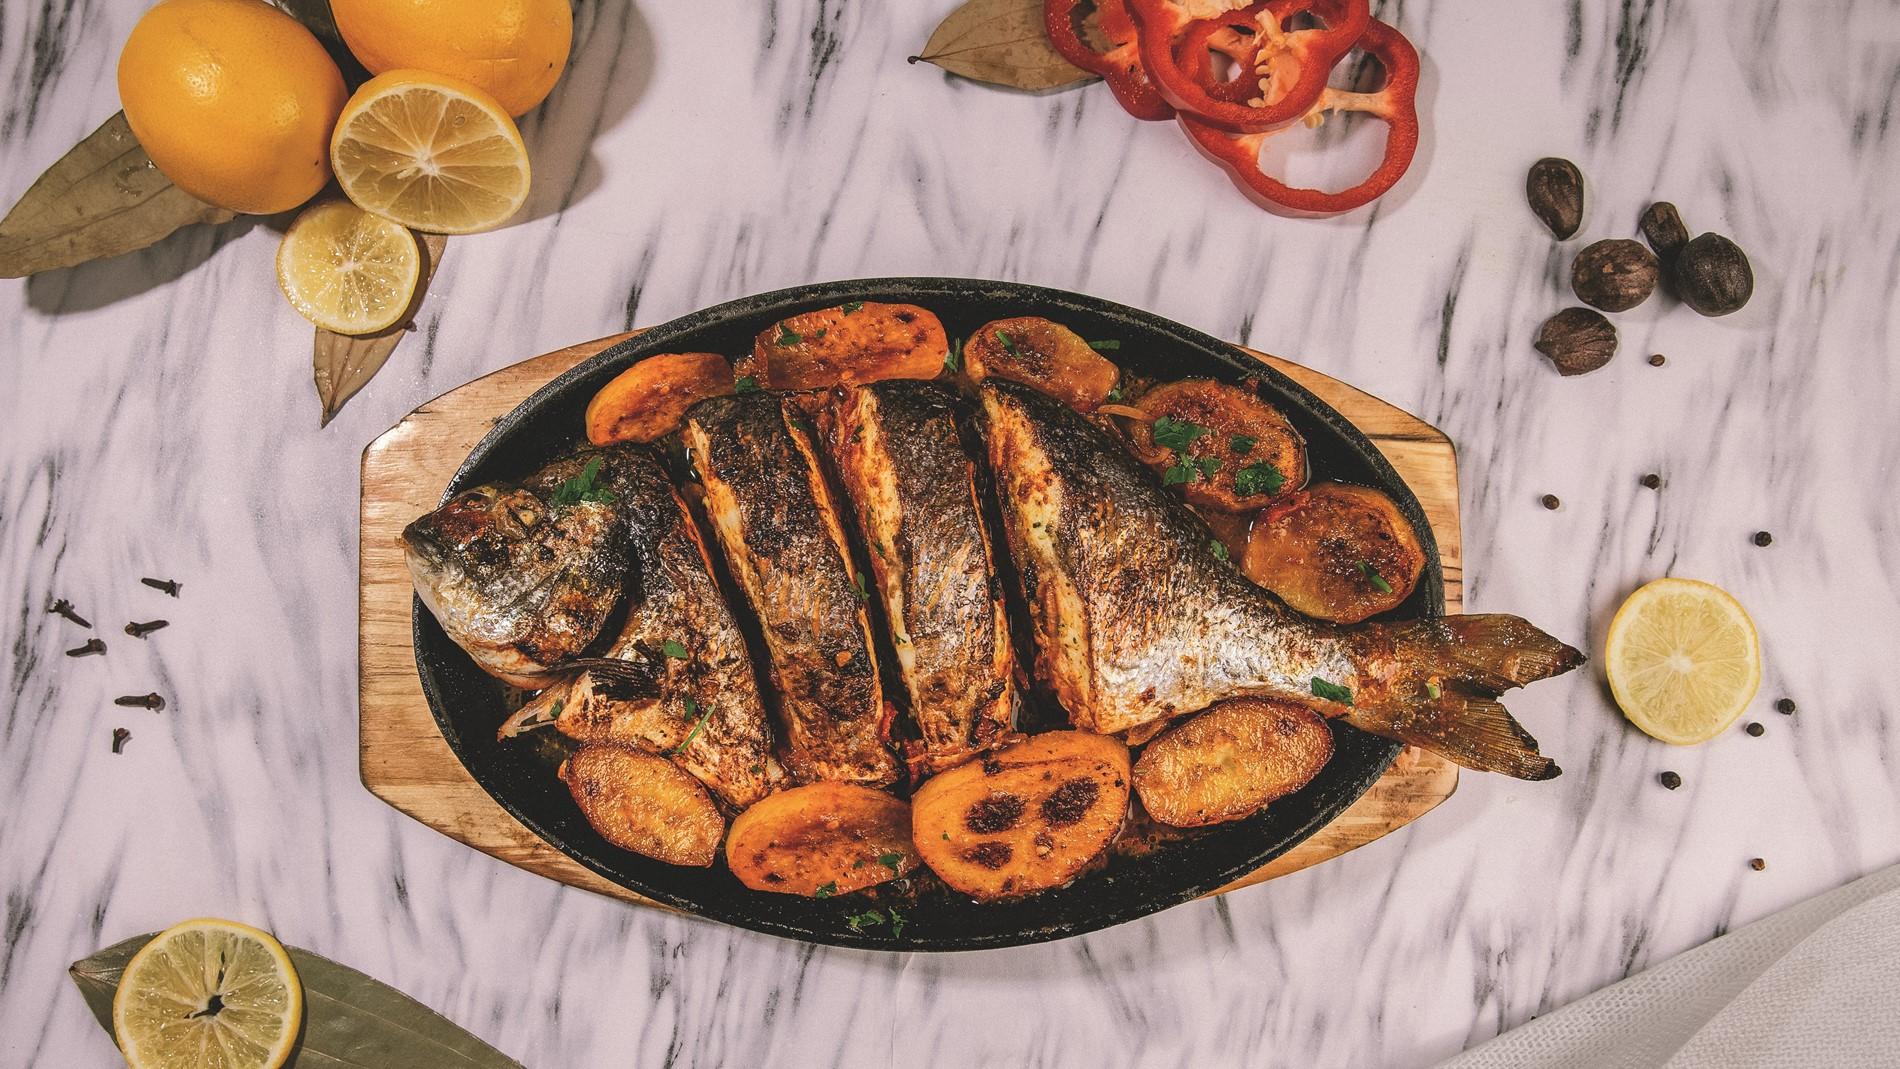 سمكة سي بريم بالزيت والليمون